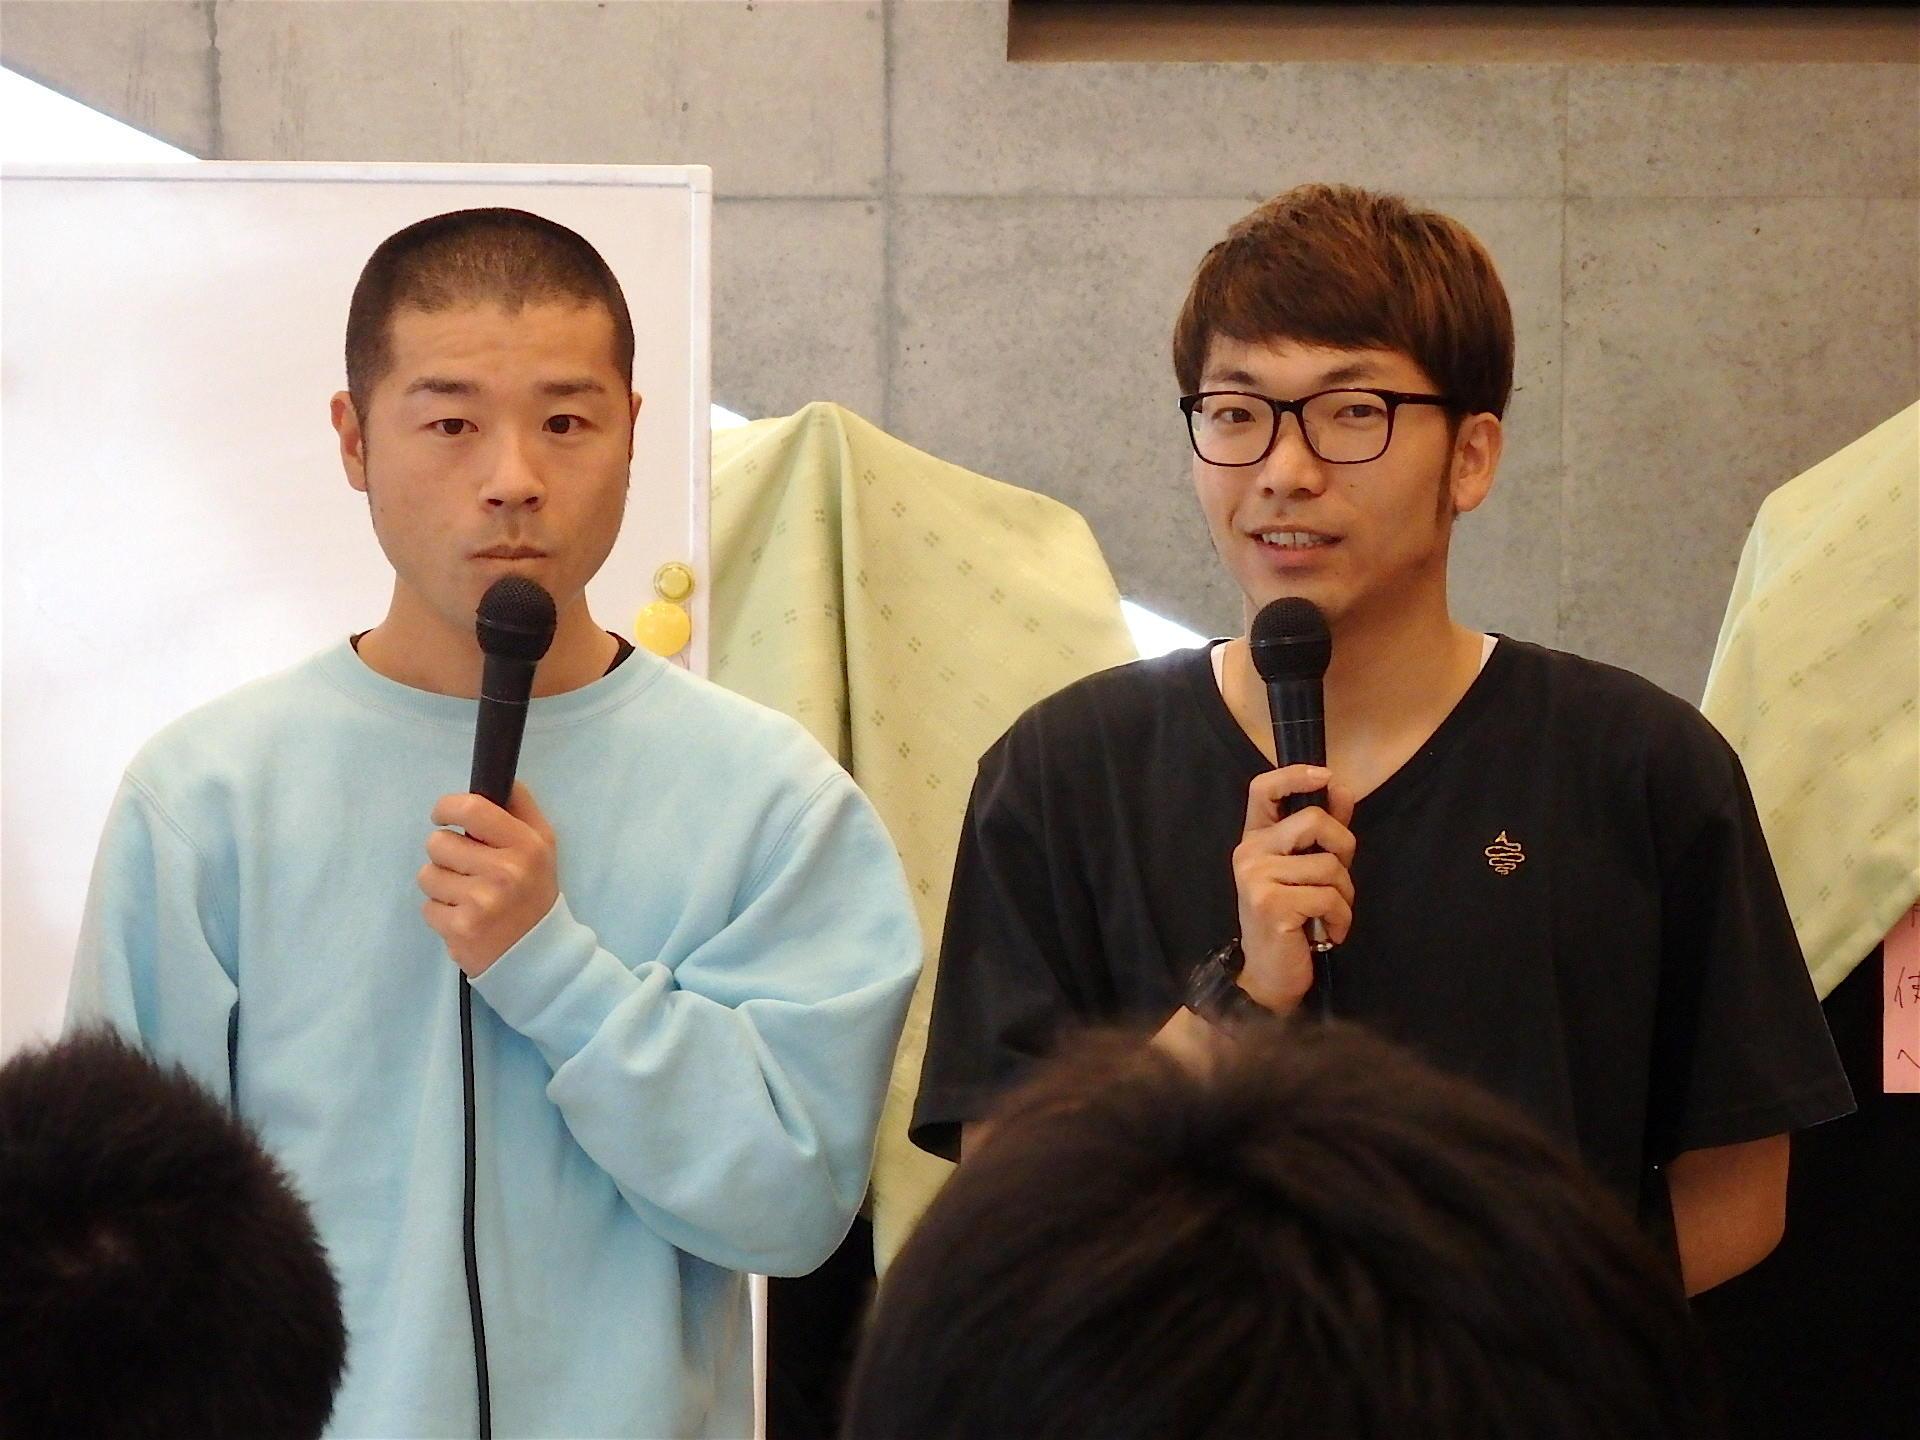 http://news.yoshimoto.co.jp/20160430235625-f547a5c5df7f8dda698a34d926af2837cc82f95f.jpg